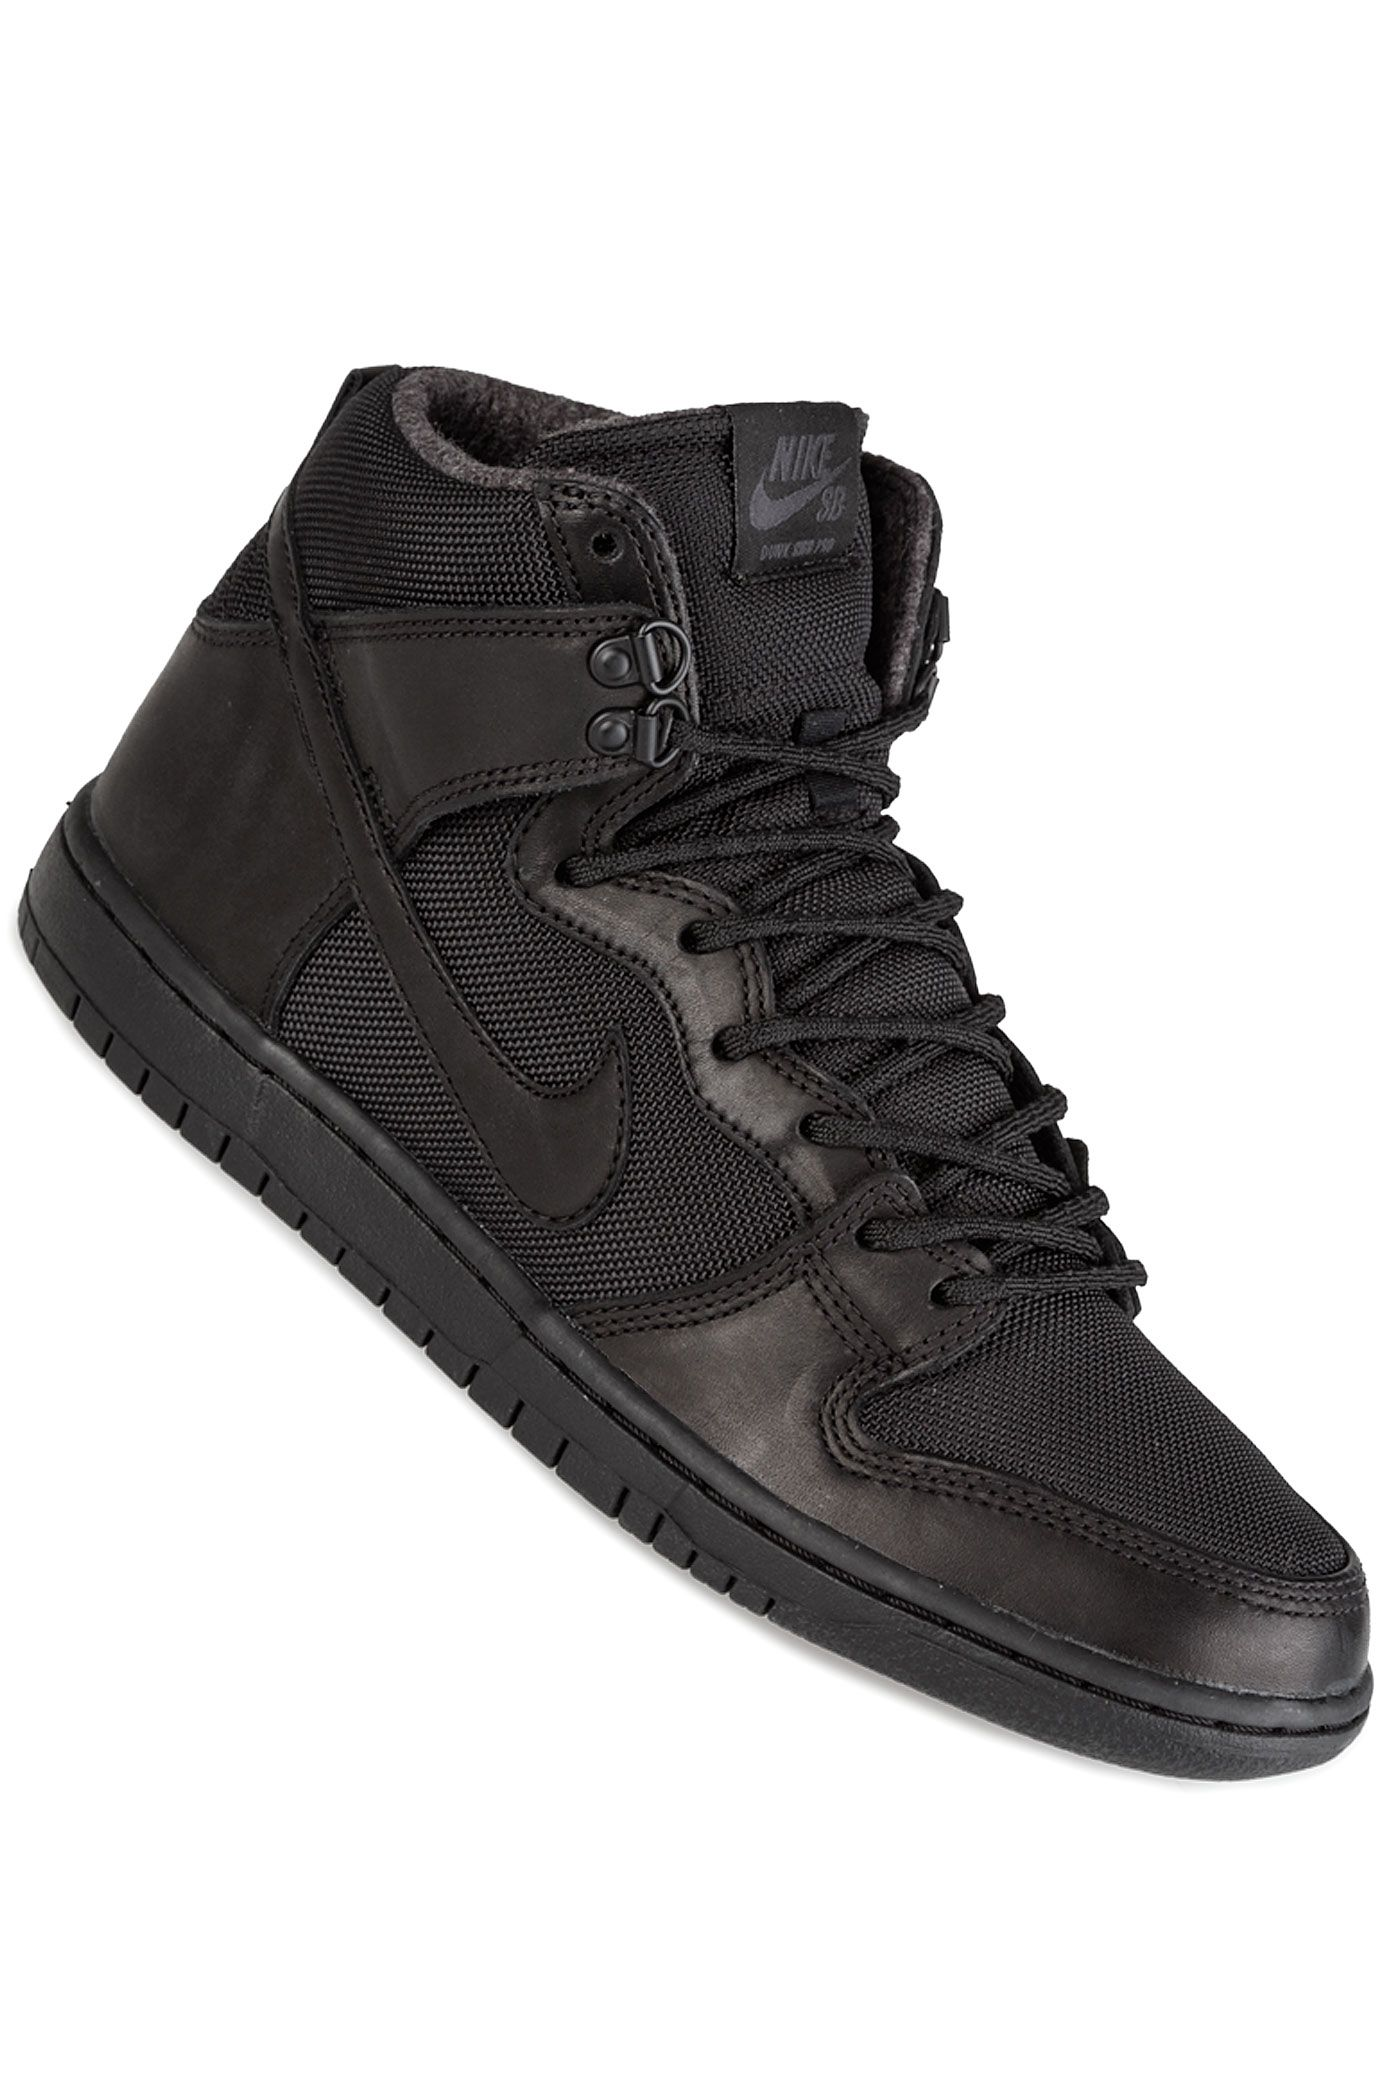 Nike SB Dunk Hi Pro Bota Schoen (black black) in 2019